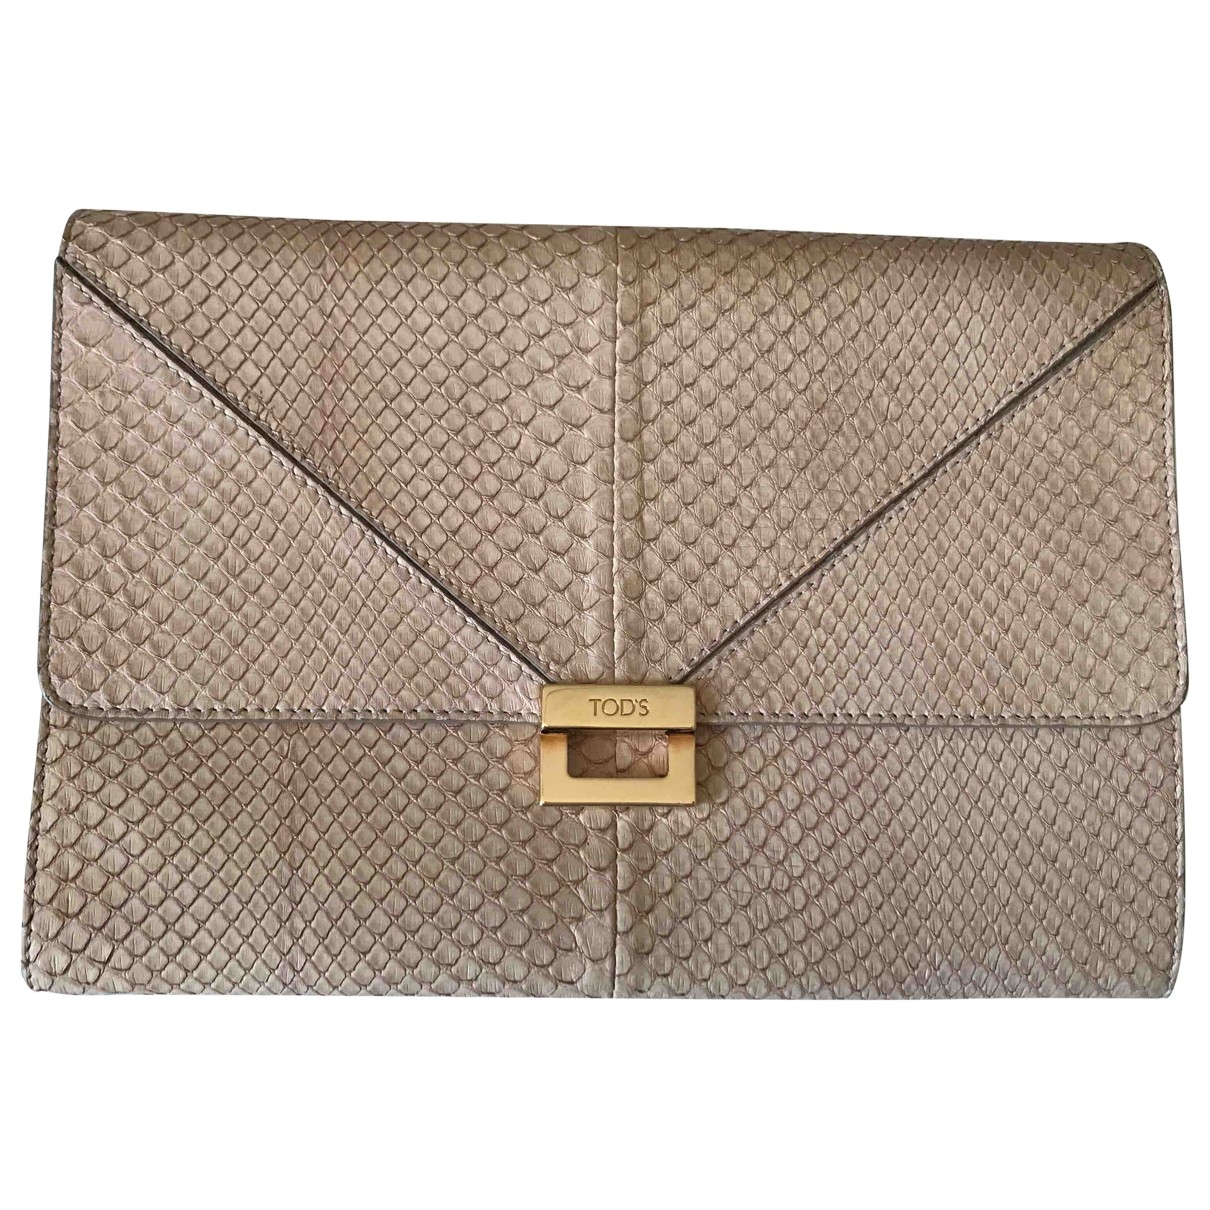 Tod's \N Pink Python Clutch bag for Women \N